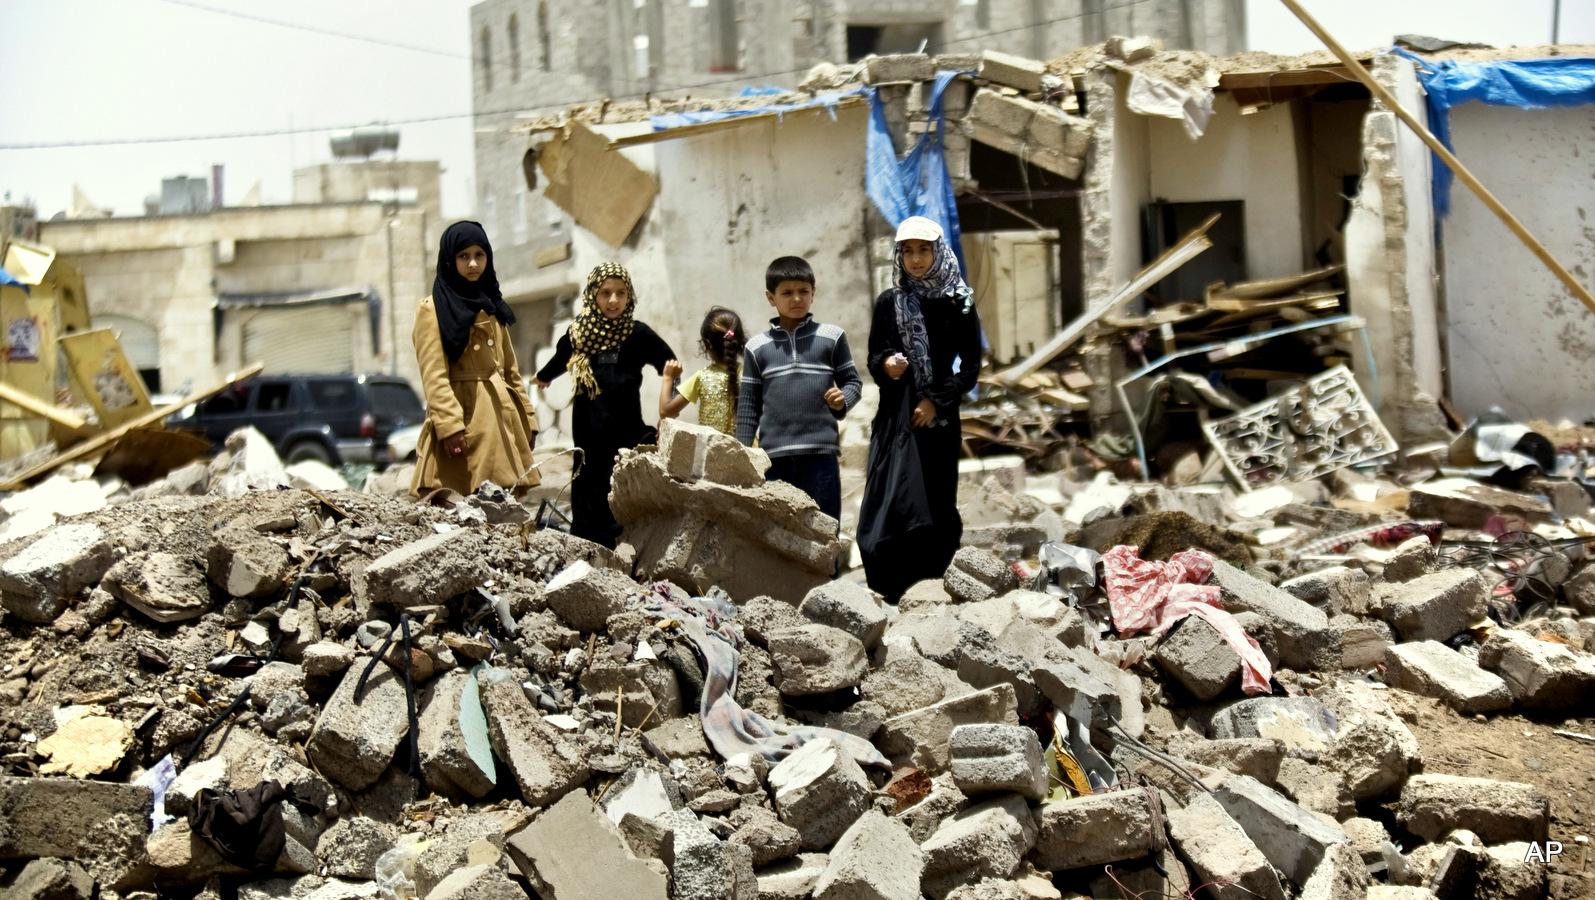 13990615001141 Test NewPhotoFree - گفتوگو با خبرنگار حاضر در کشتی «نجات» | یمن را خبر یک جهان کردیم